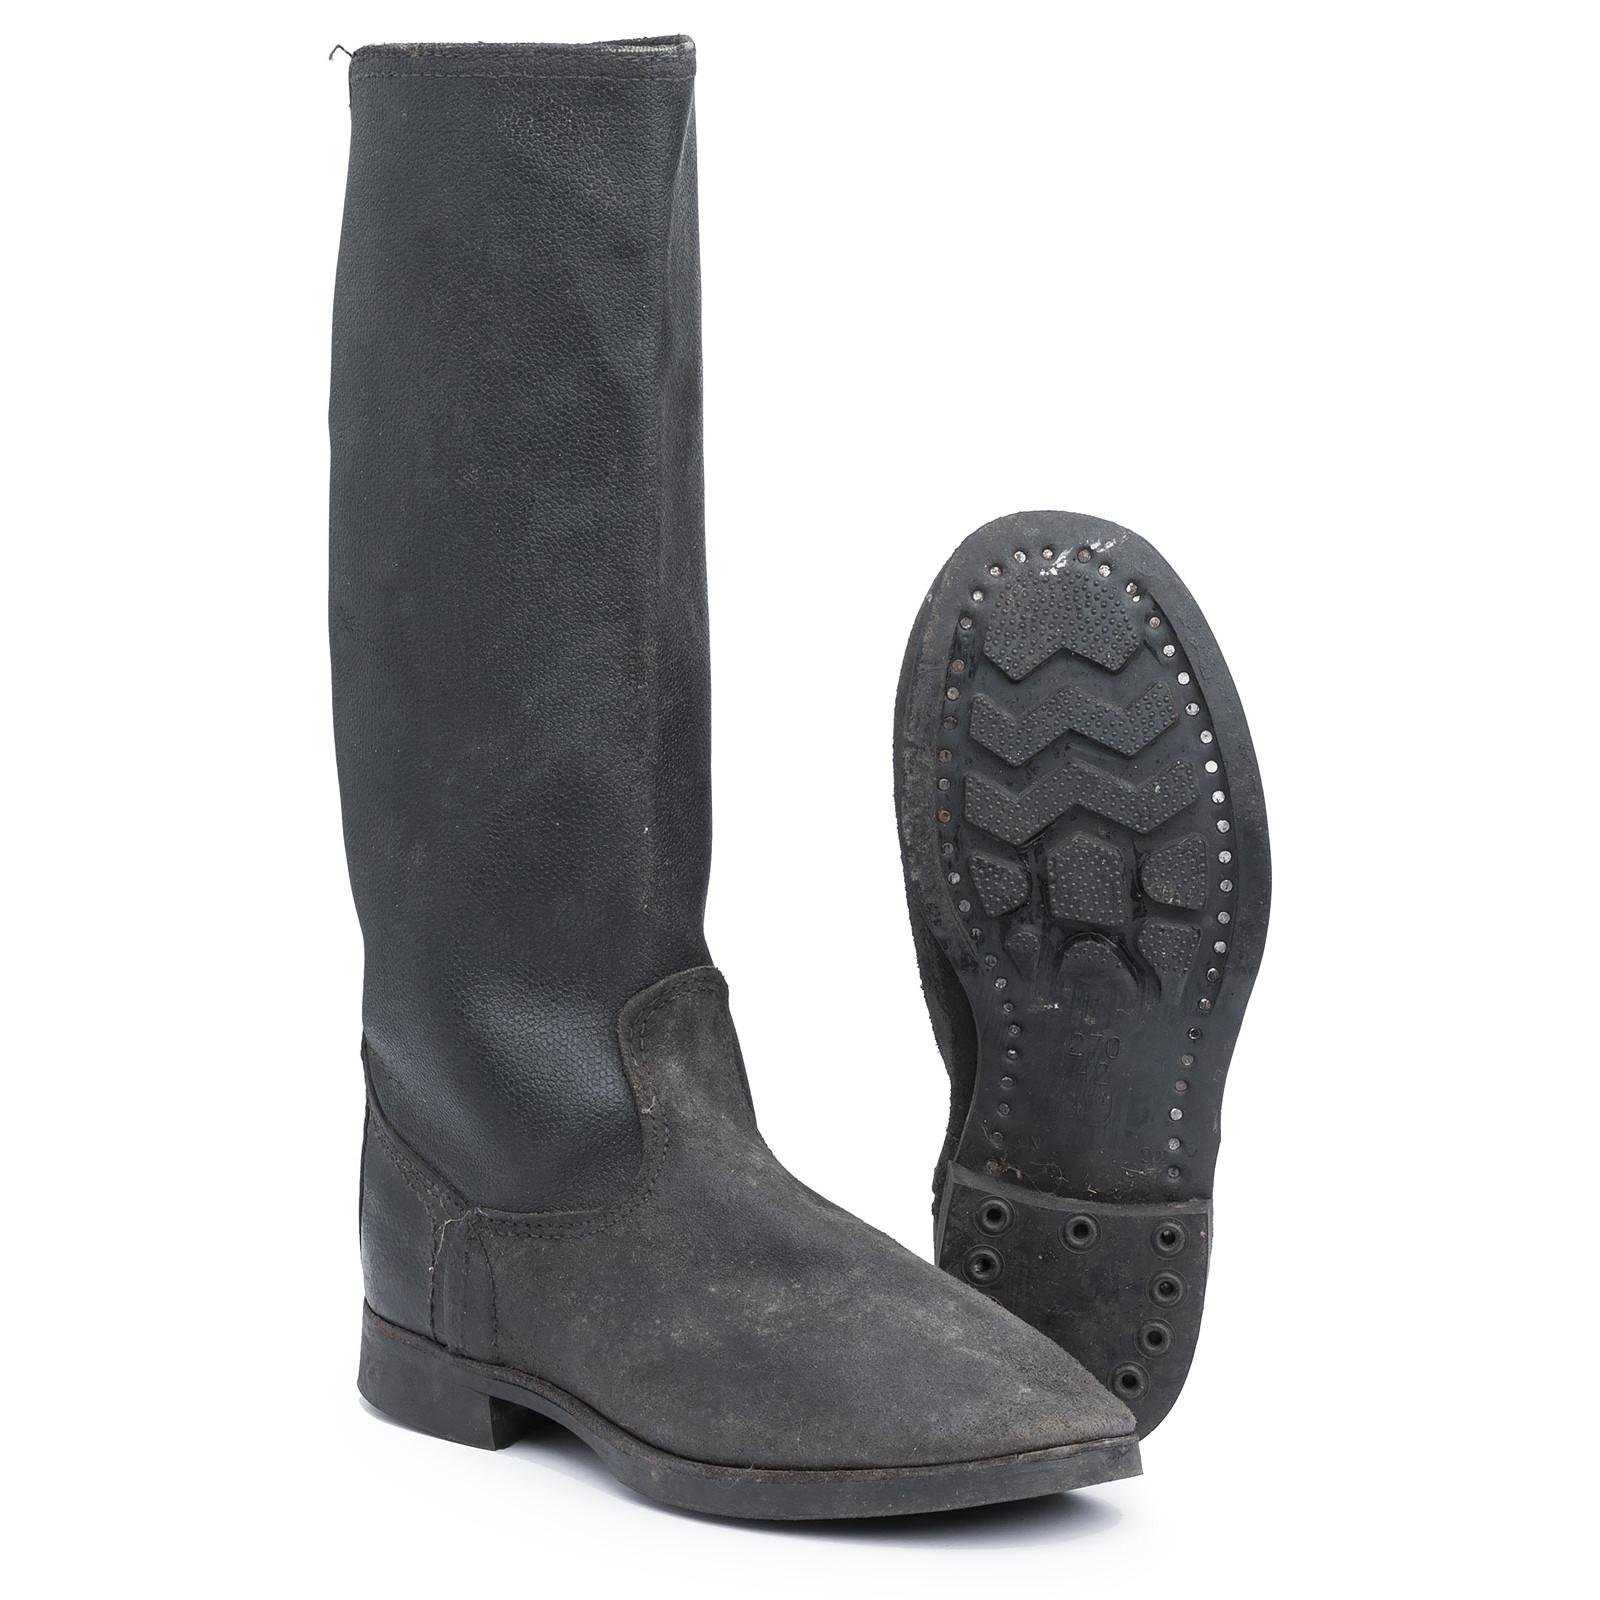 46af2ddc079 Soviet Kirza boots, surplus